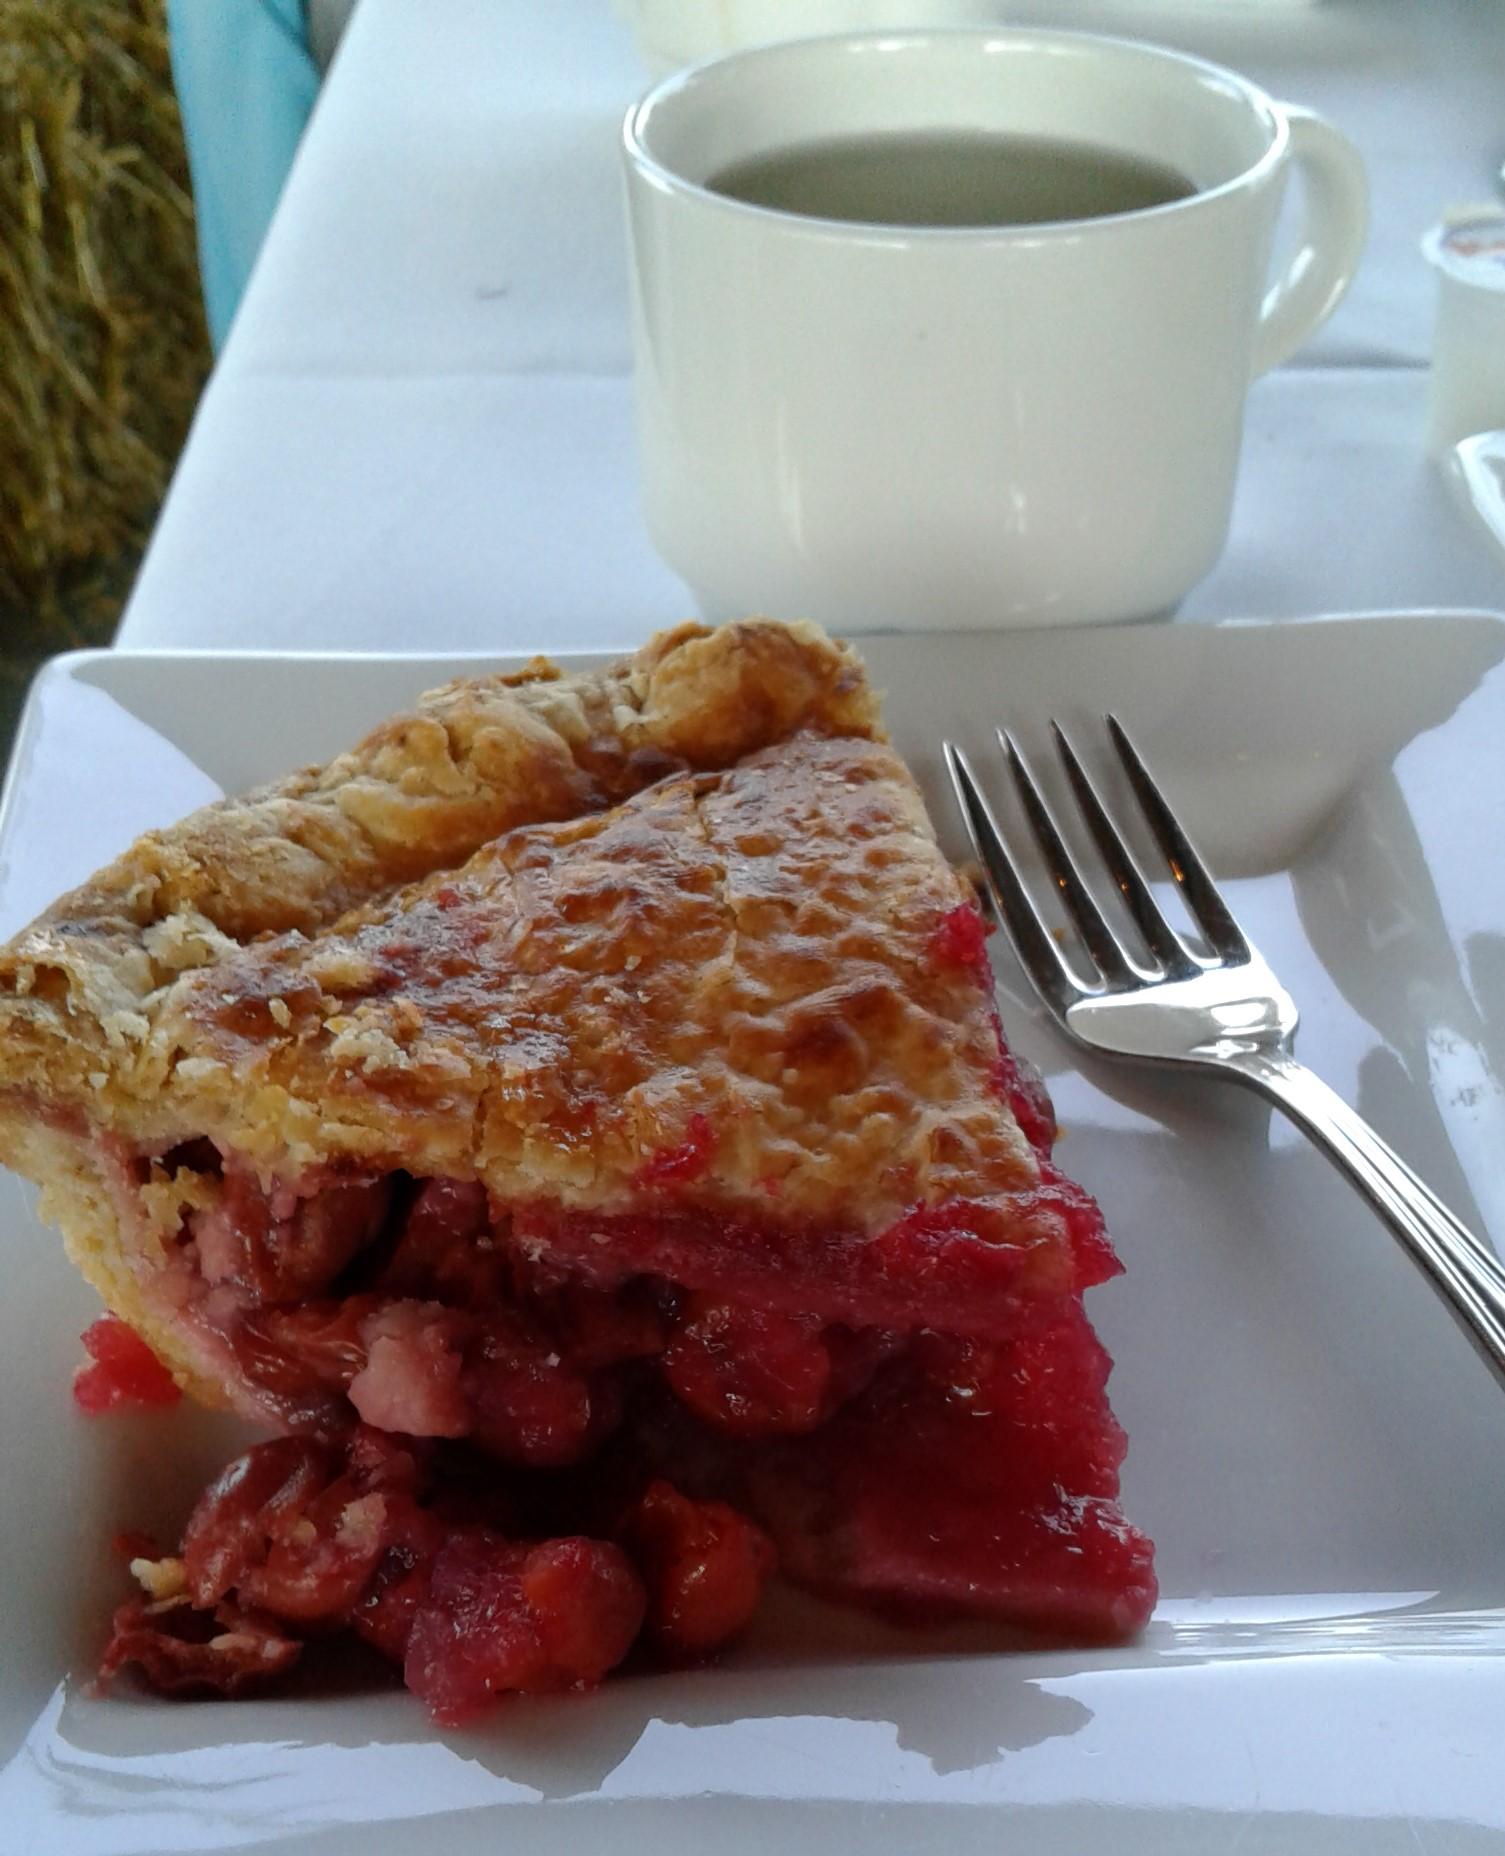 Harvestfest Pie and coffee